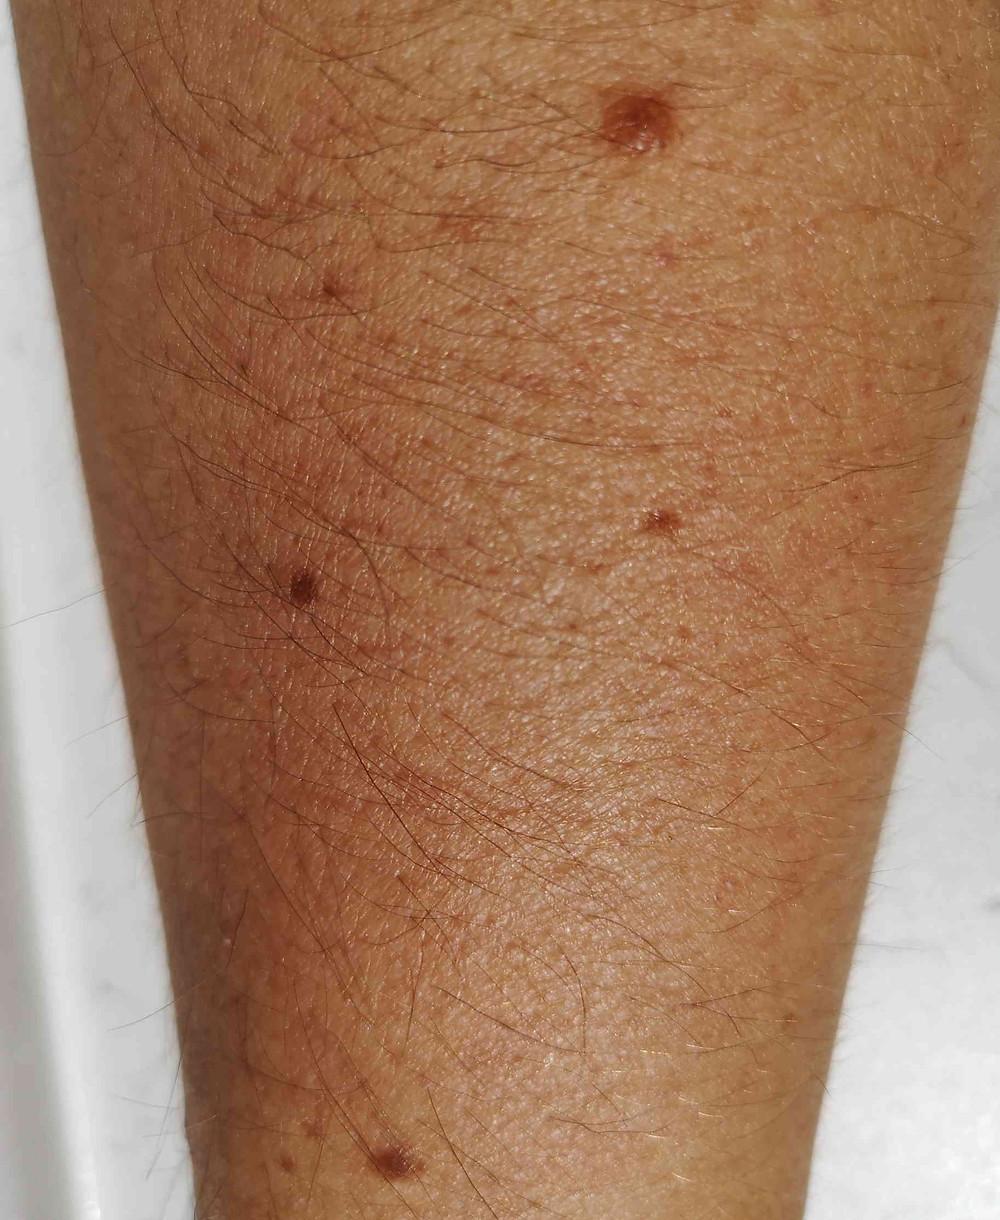 multiple naevi (moles)